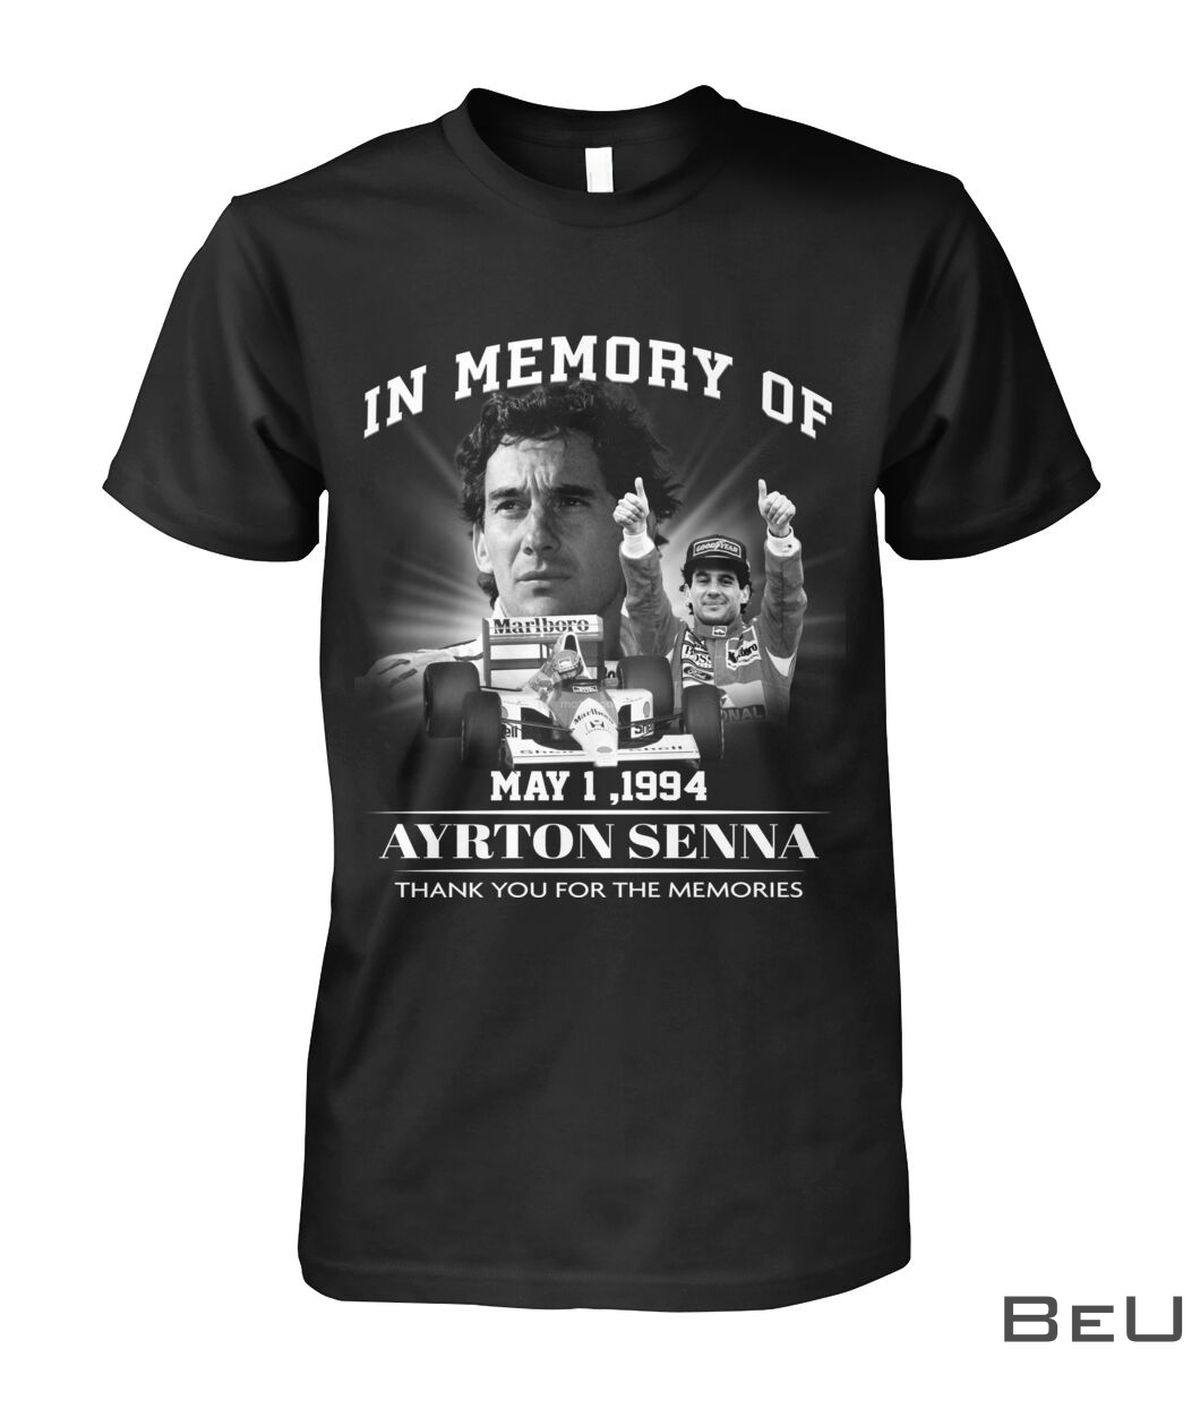 In Memory Of May 1, 1994 Ayrton Senna Thank You For The Memories Shirt